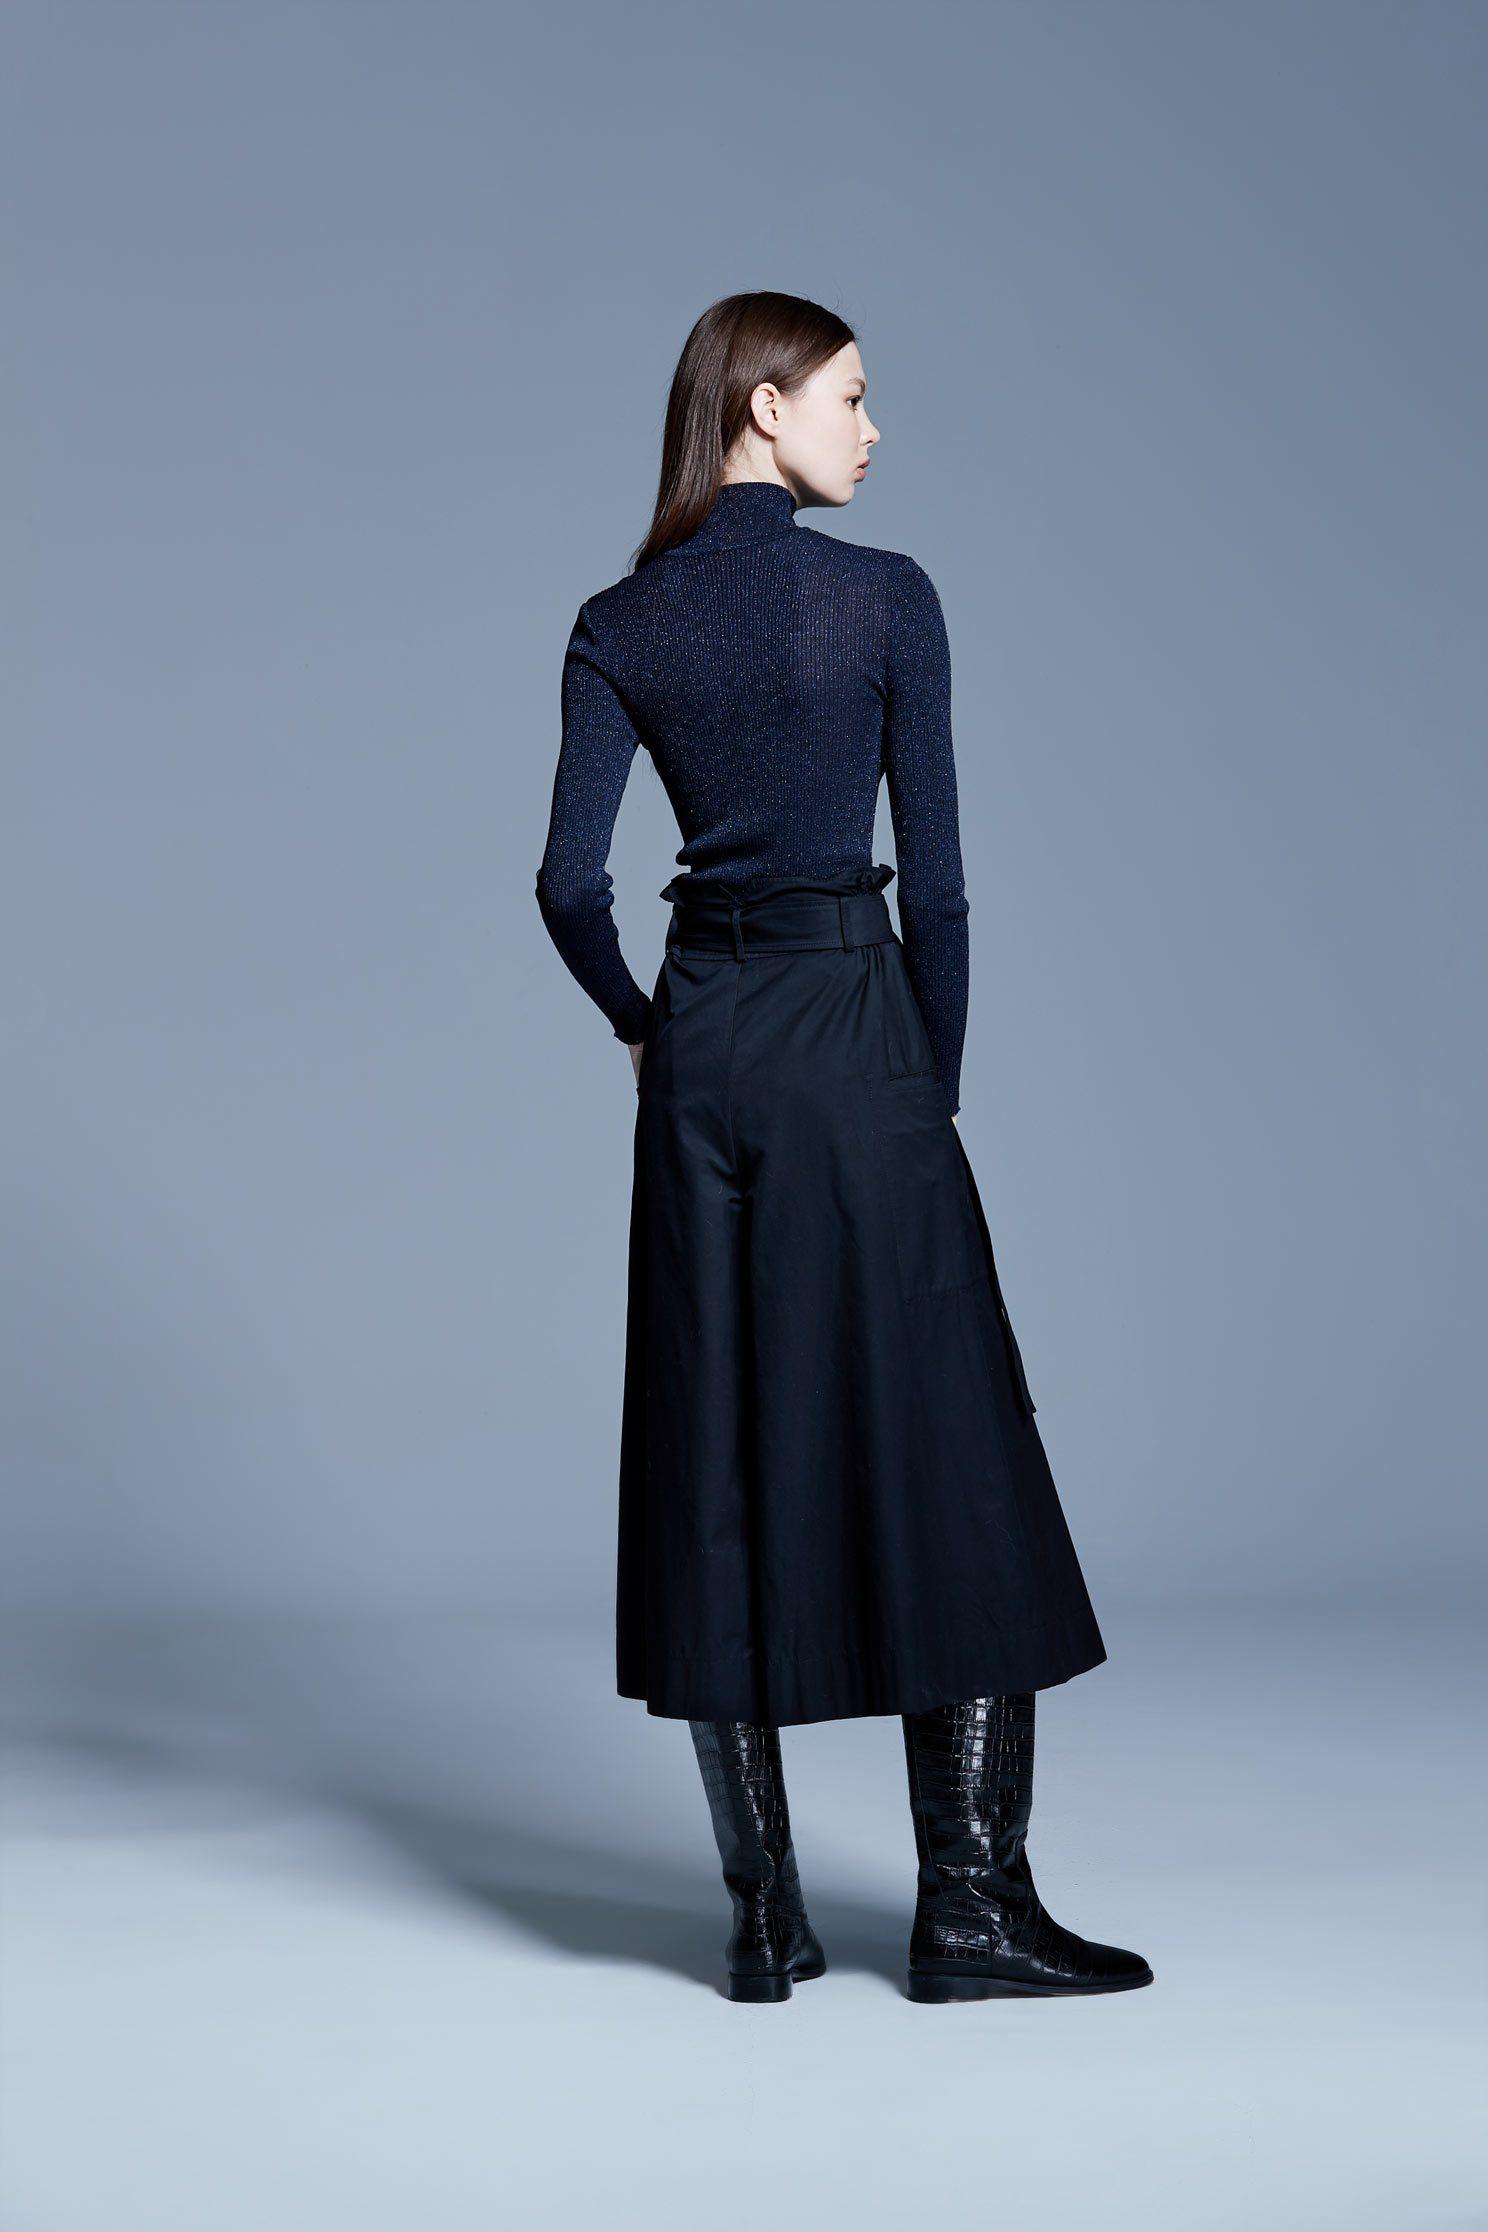 Classic Fashion Wide Trouser,culottespants,pants,culottes,pants,wasthin,blackpants,blacktrousers